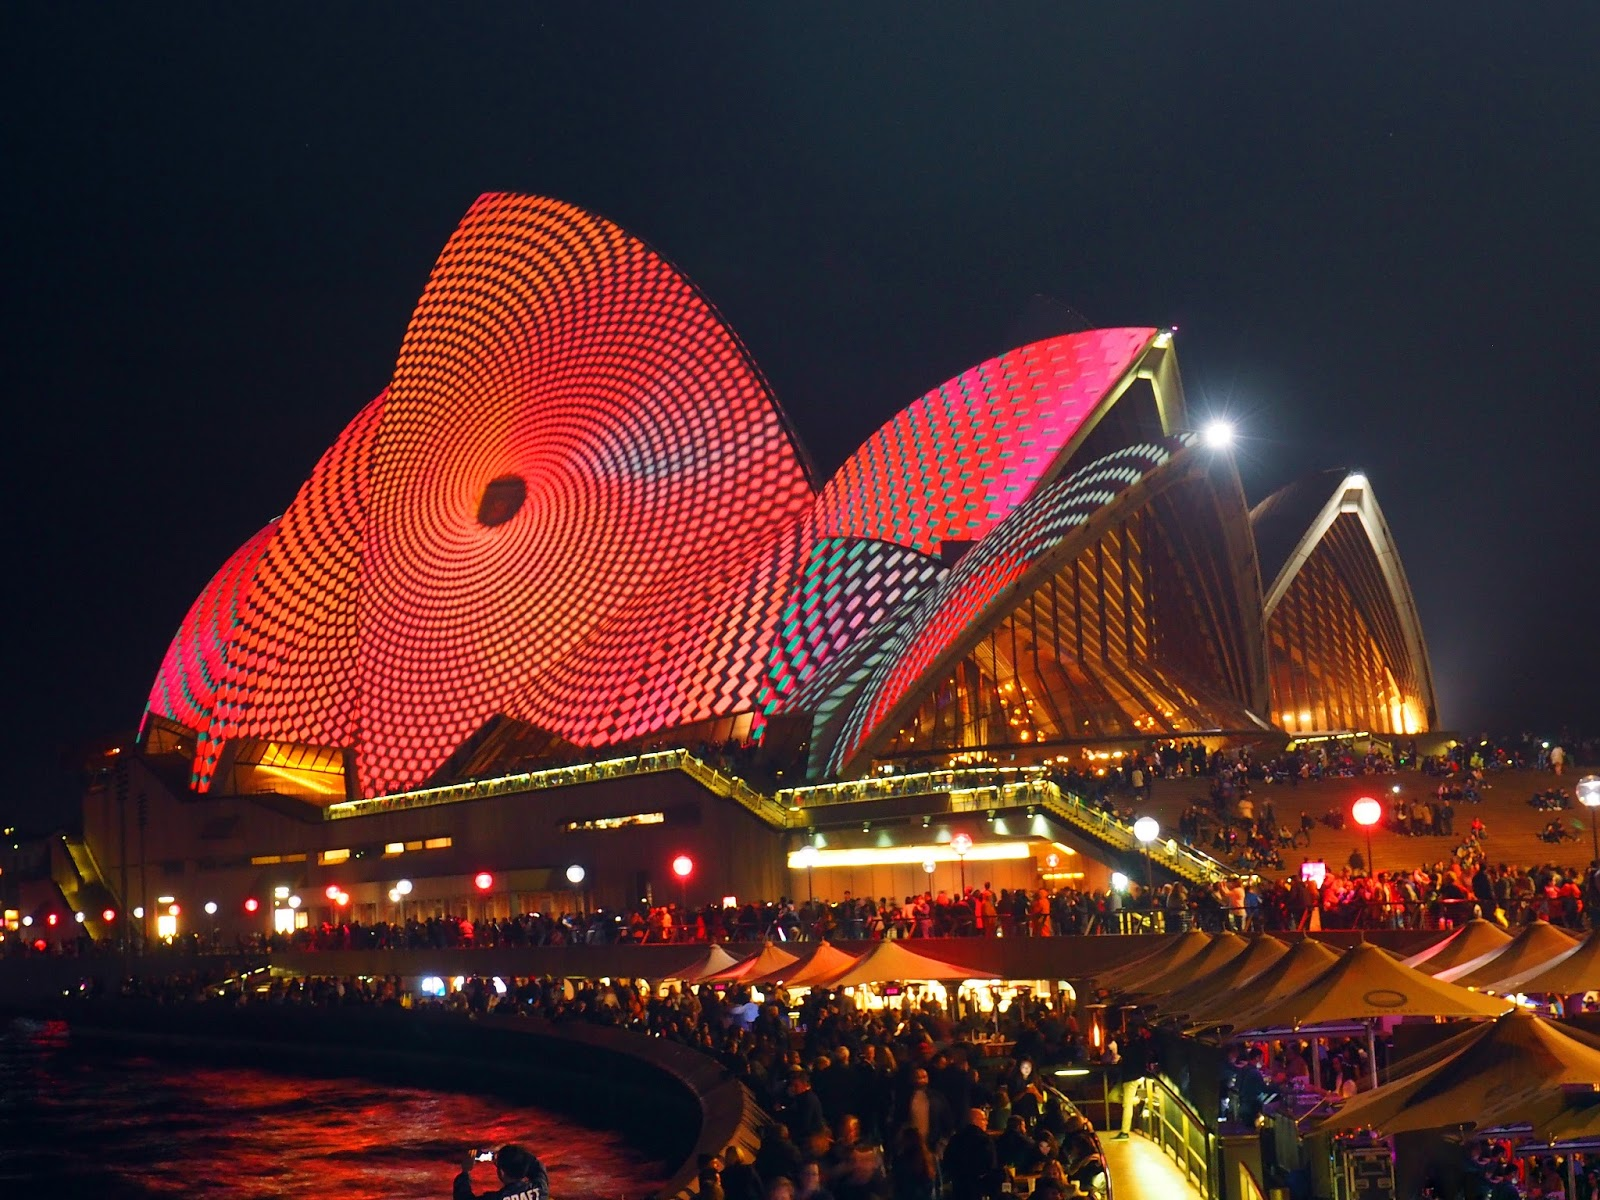 Opera House Vivid Festival Sydney